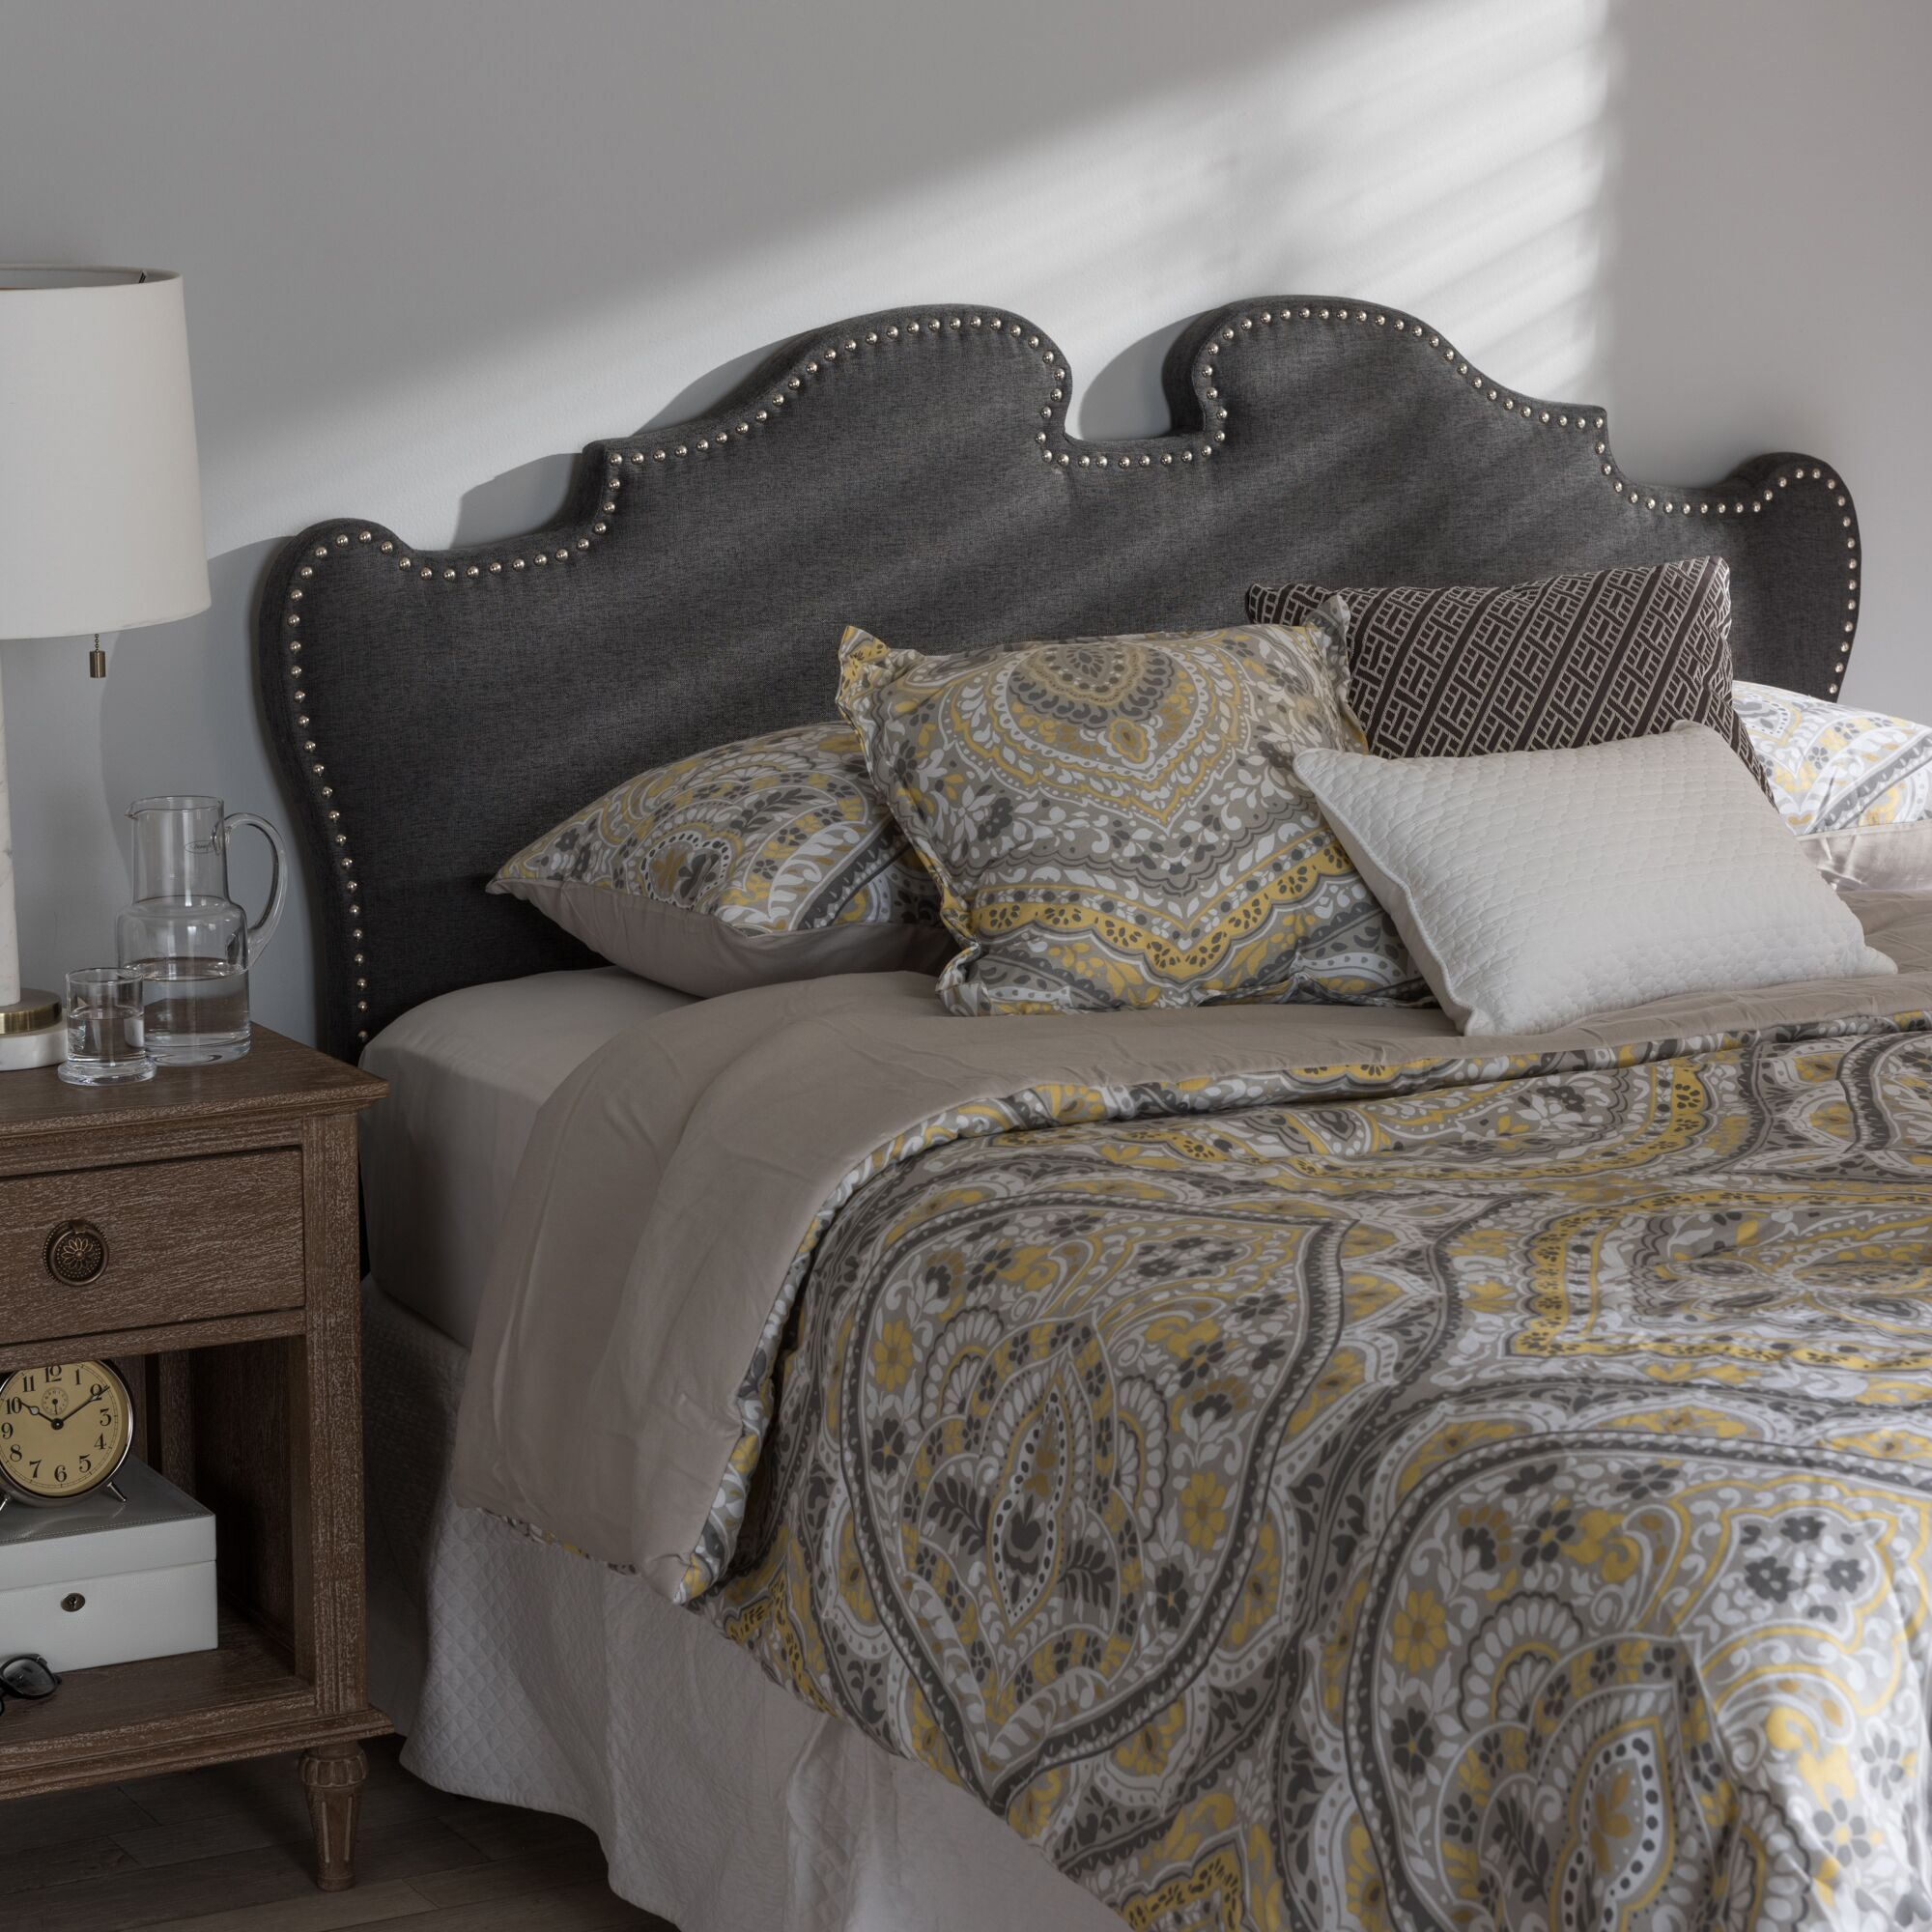 Brockett Upholstery Panel Headboard Upholstery: Dark Gray, Size: King